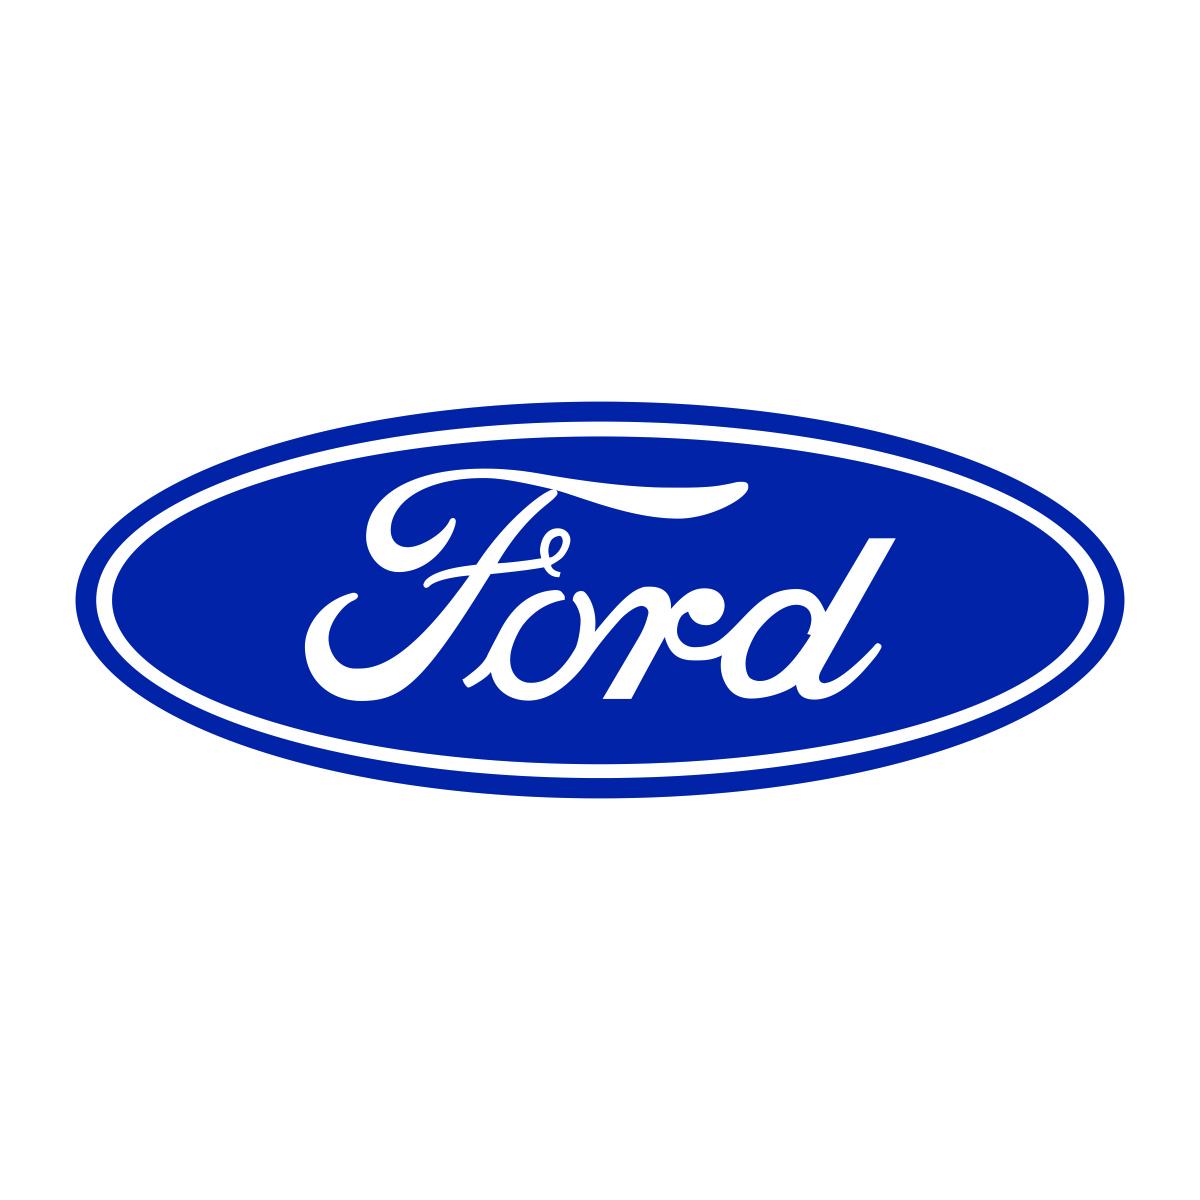 https://secureservercdn.net/45.40.150.47/08r.a40.myftpupload.com/wp-content/uploads/2019/04/Ford.jpg